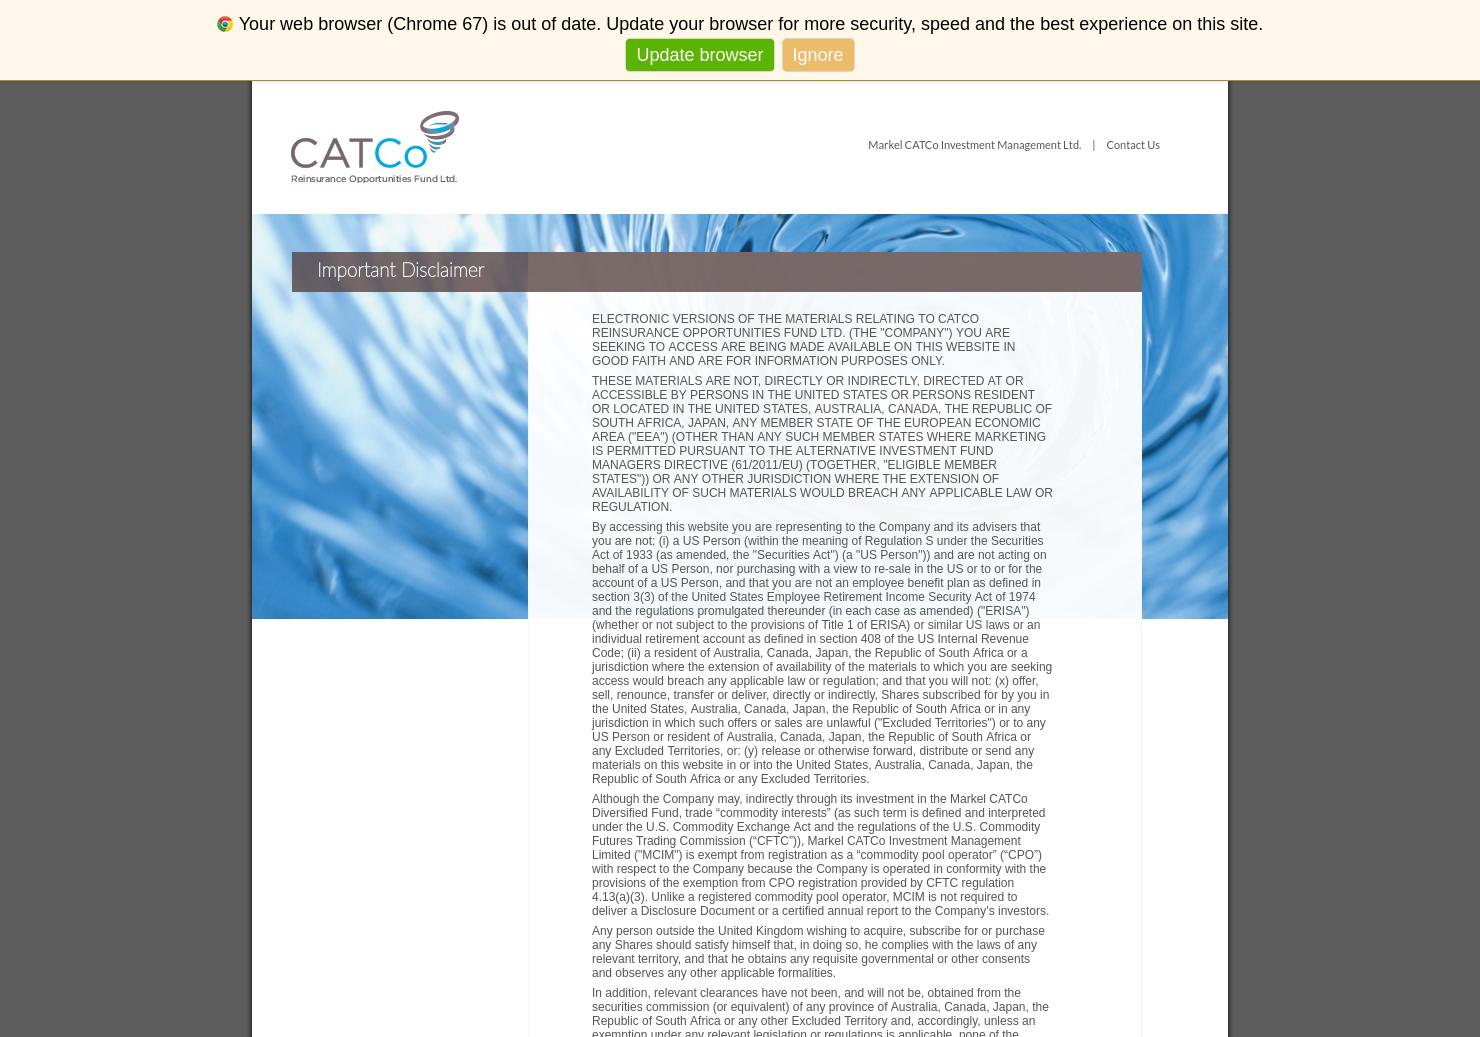 CATCo Home Page